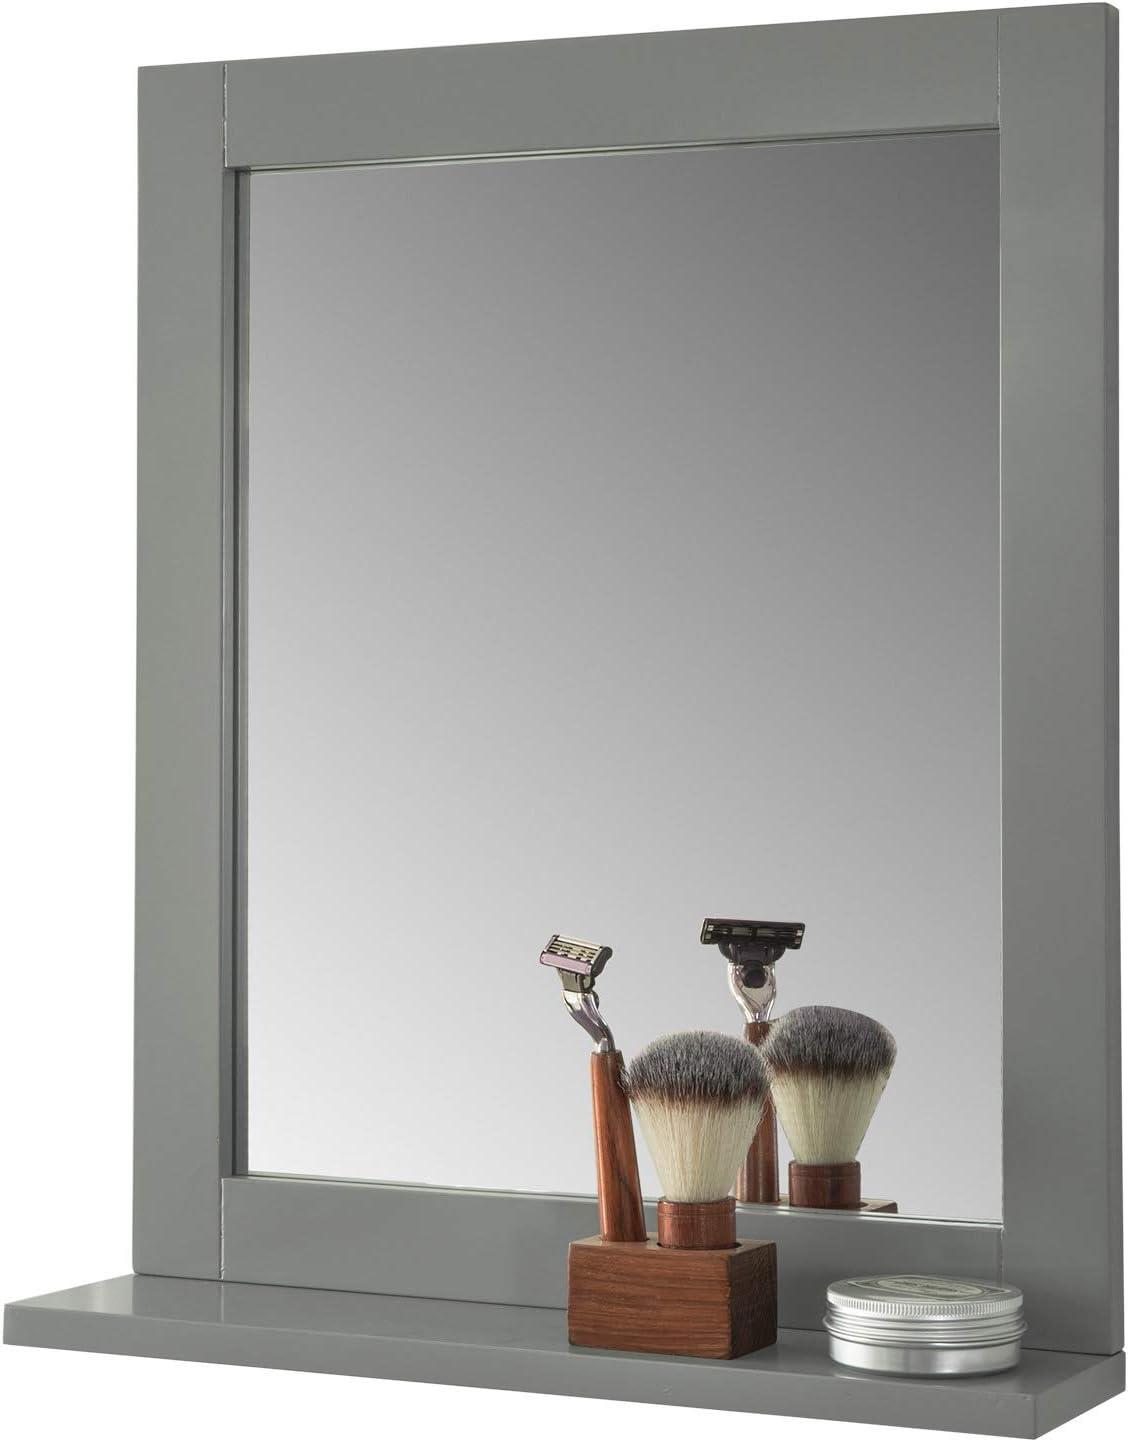 SoBuy/® FRG129-SG Miroir Mural Meuble Salle de Bain avec 1 /étage Plateau